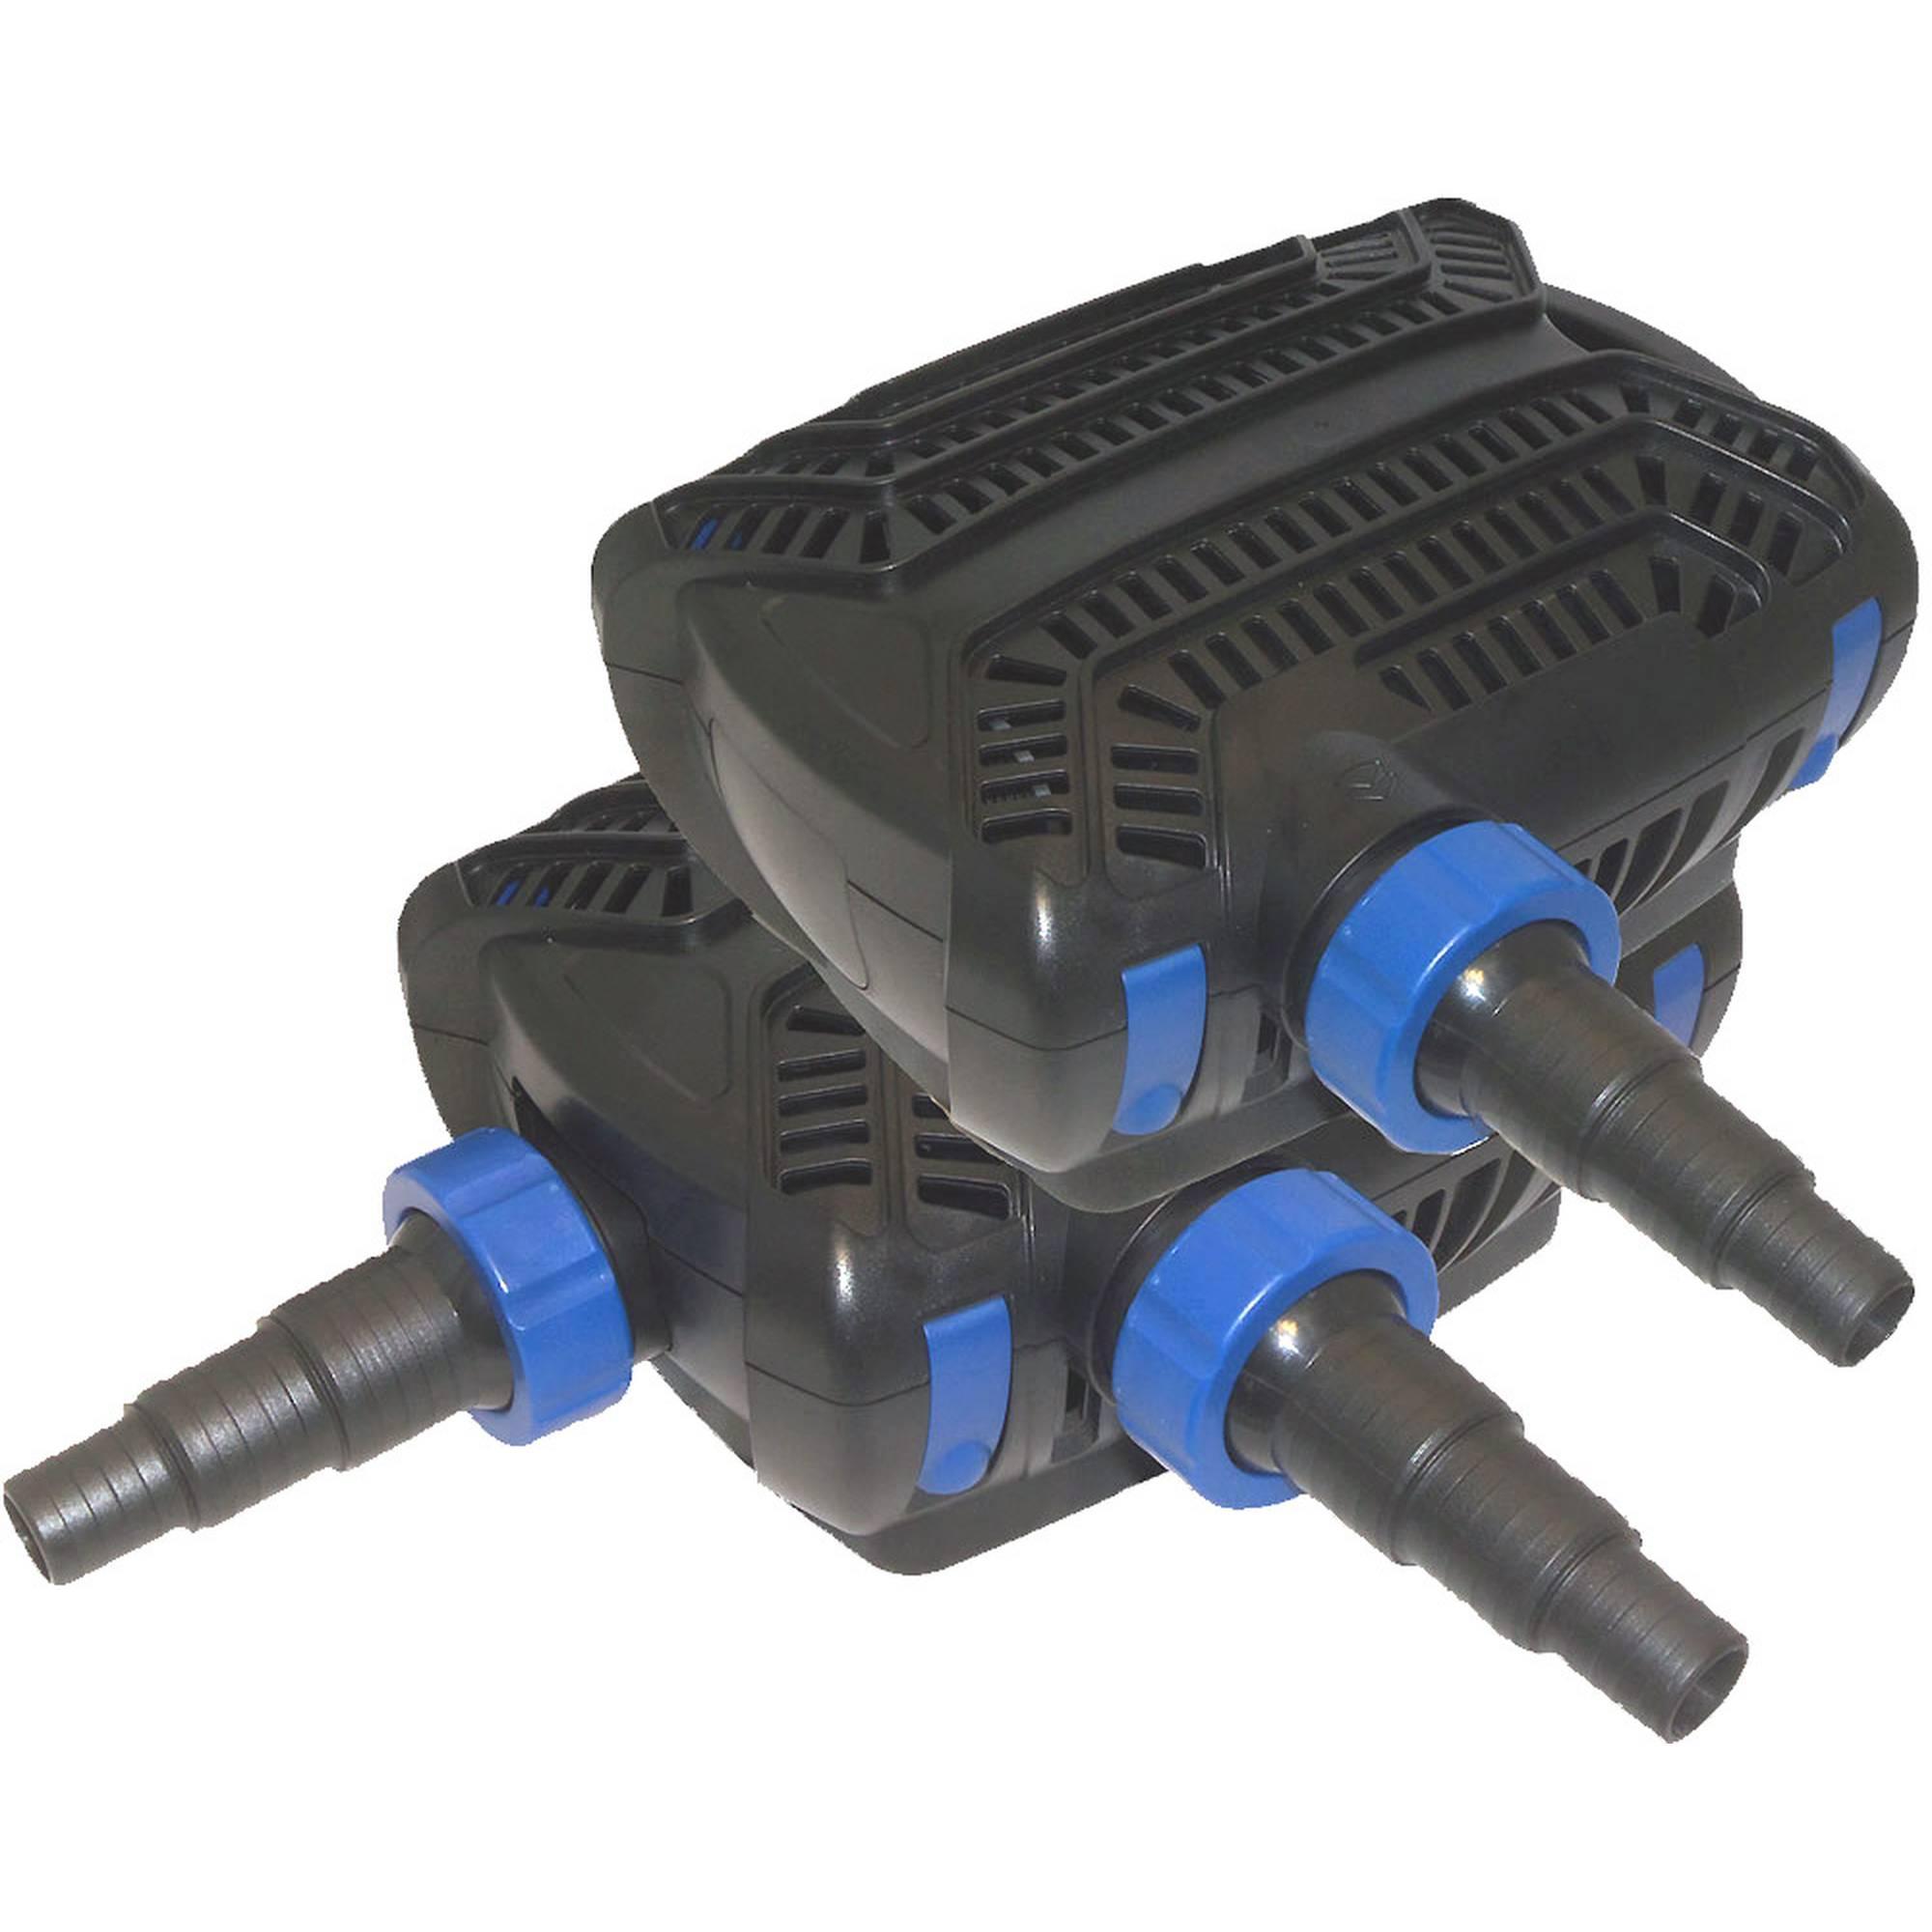 AKWADO CTF-Serie Filterpumpe, Bachlaufpumpe, Teichpumpe 5.000 - 16.000 l/h